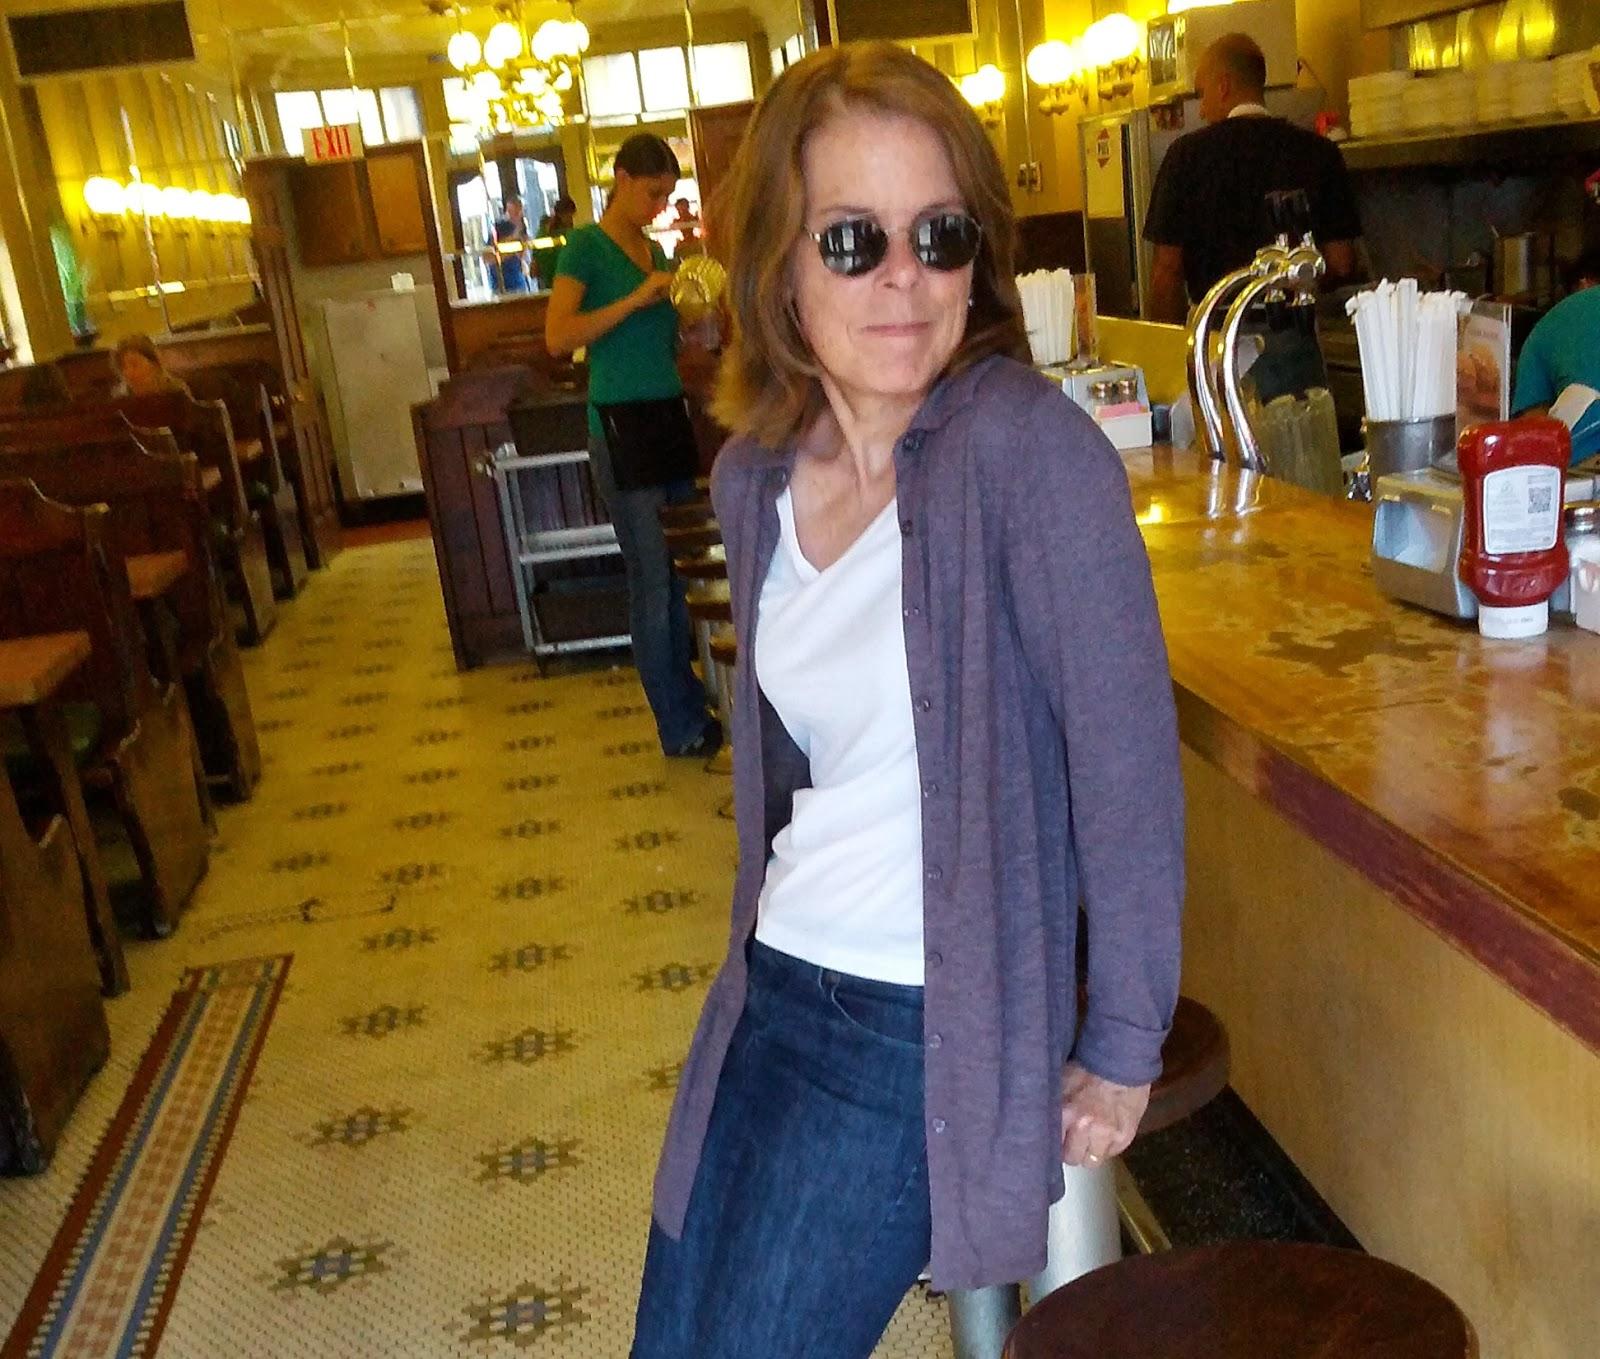 Long lavender sweater for women over 50